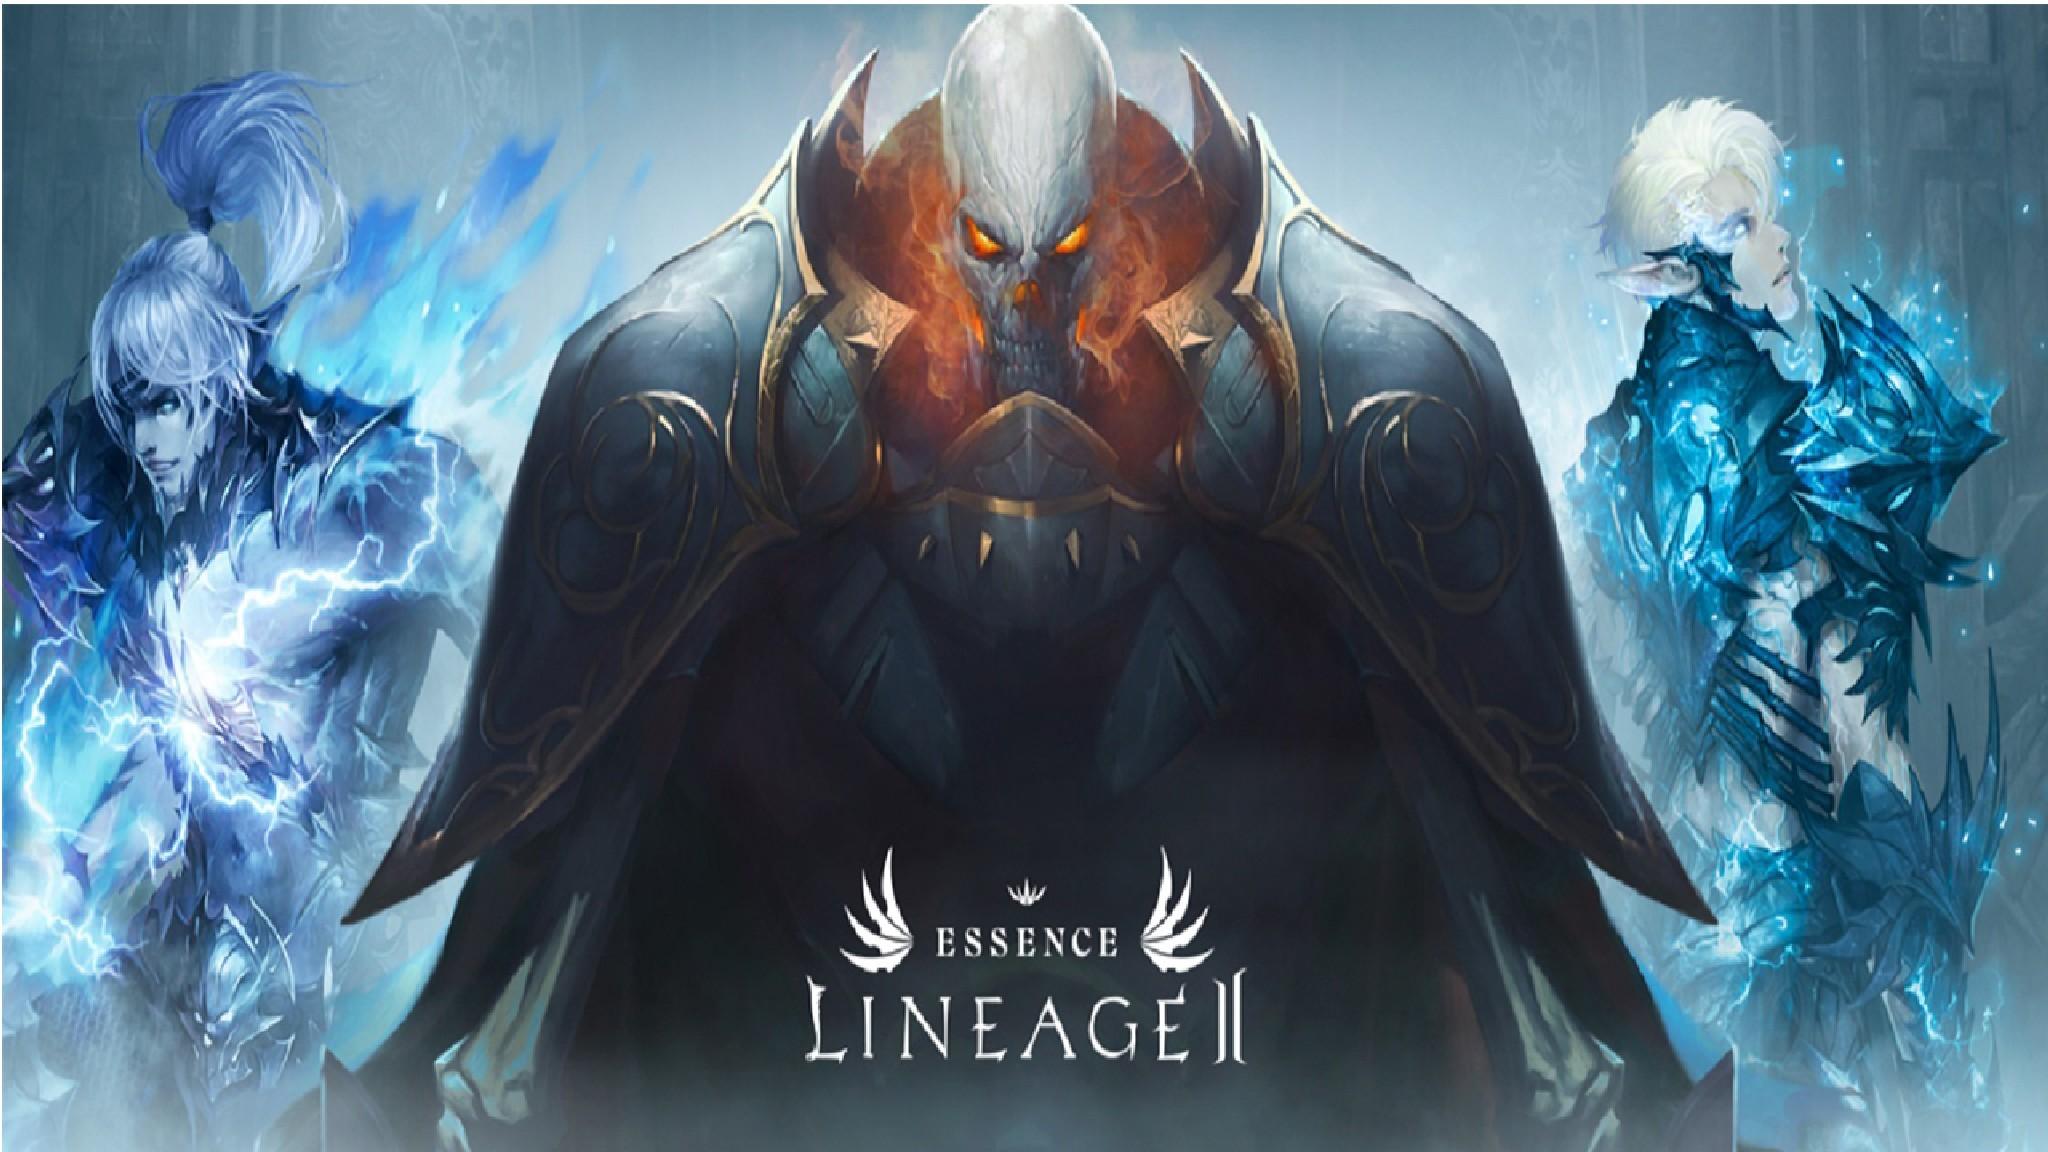 Играть Lineage 2 Essence онлайн